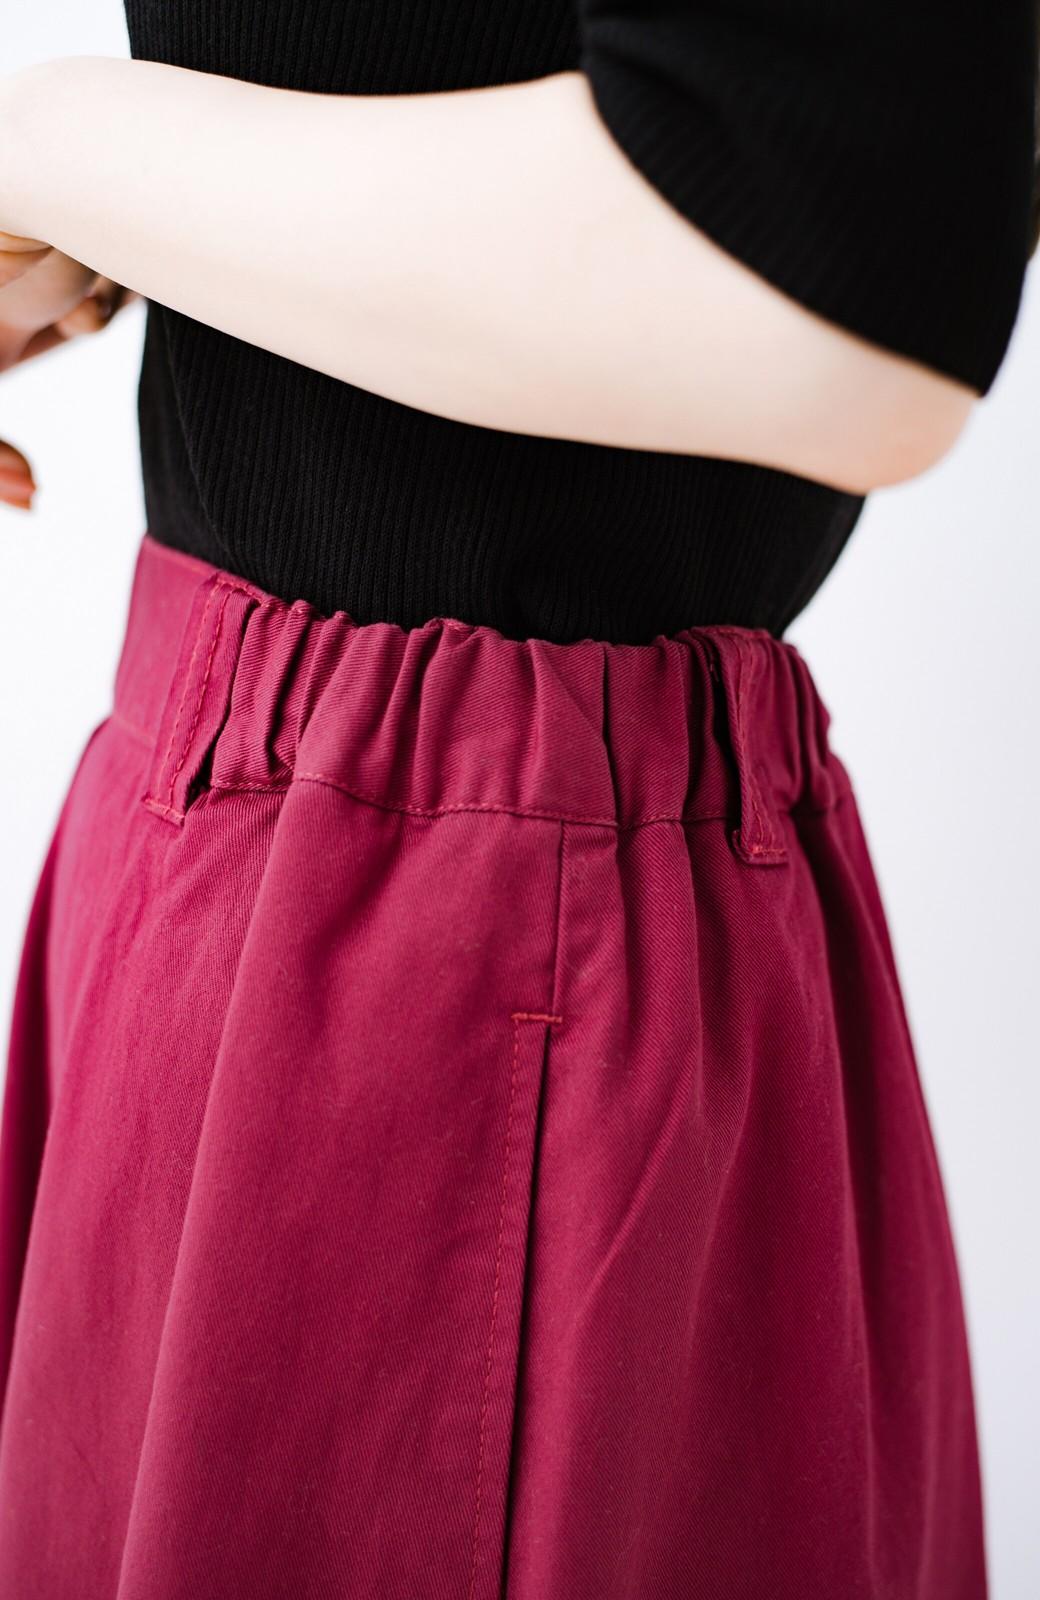 haco! ロングシーズン楽しめる タックボリュームのチノロングスカート <パープル>の商品写真7